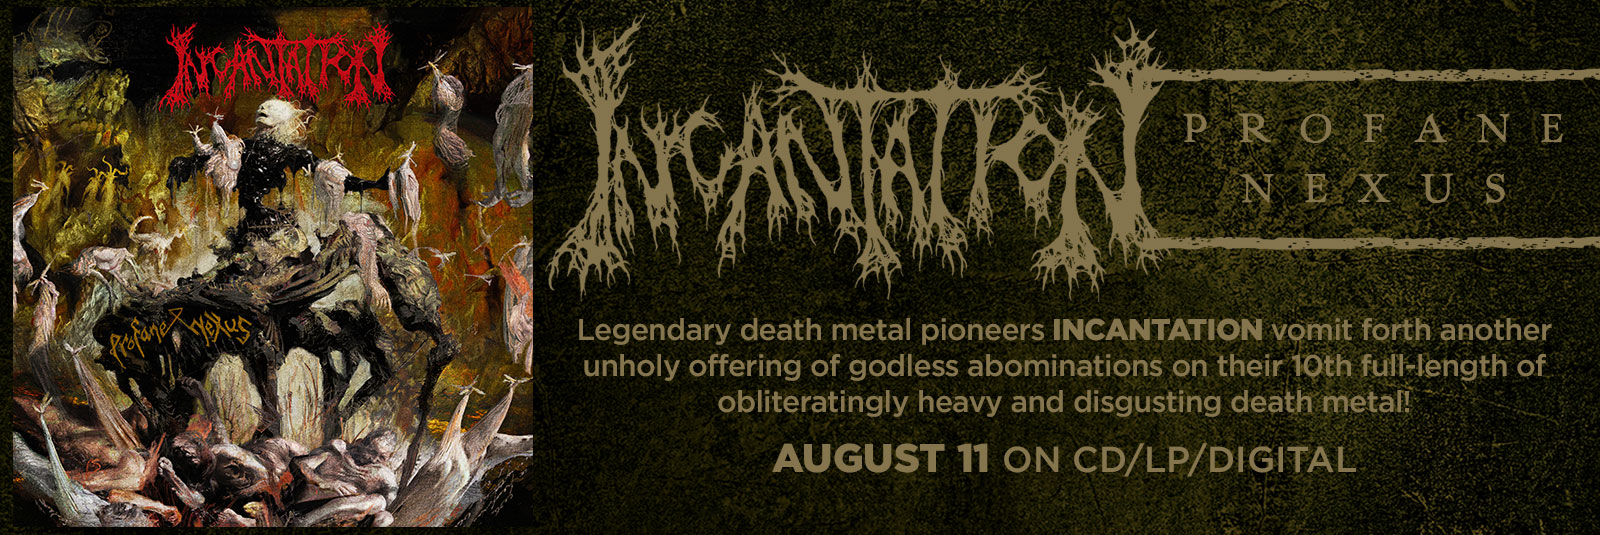 incantation-profane-nexus